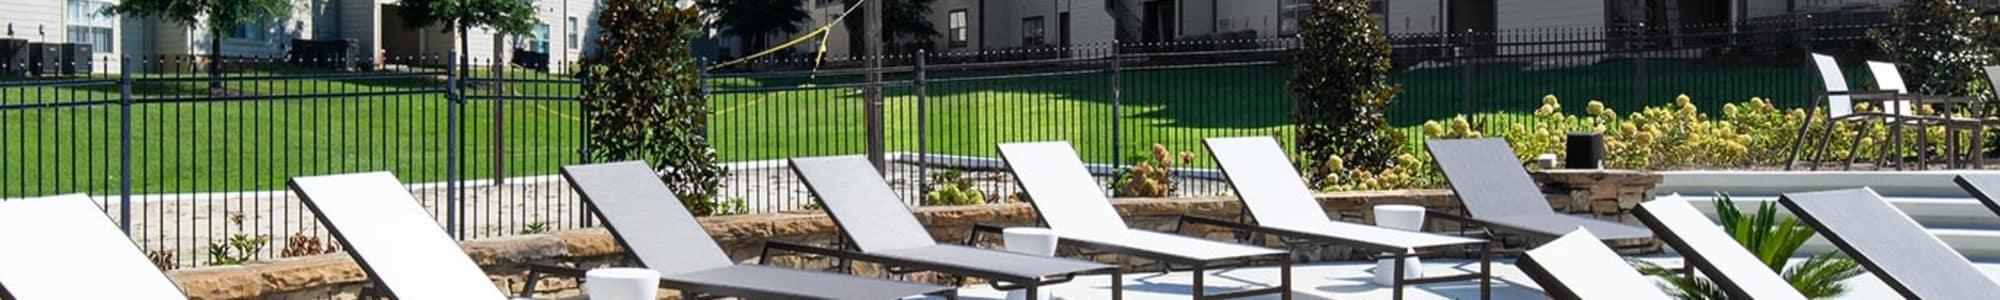 amenities at Landmark Apartments Hattiesburg